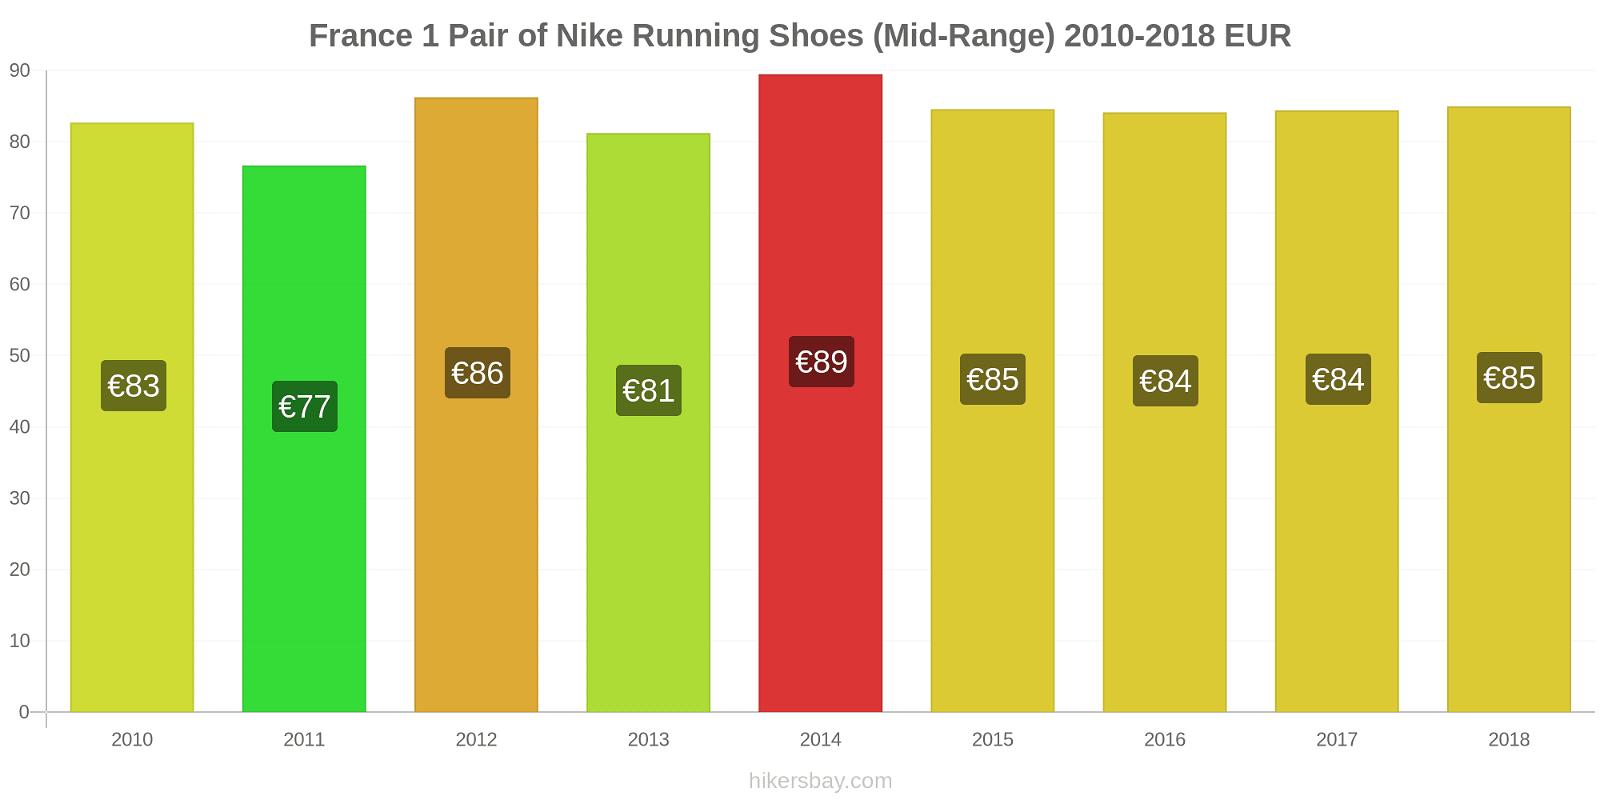 France price changes 1 Pair of Nike Running Shoes (Mid-Range) hikersbay.com